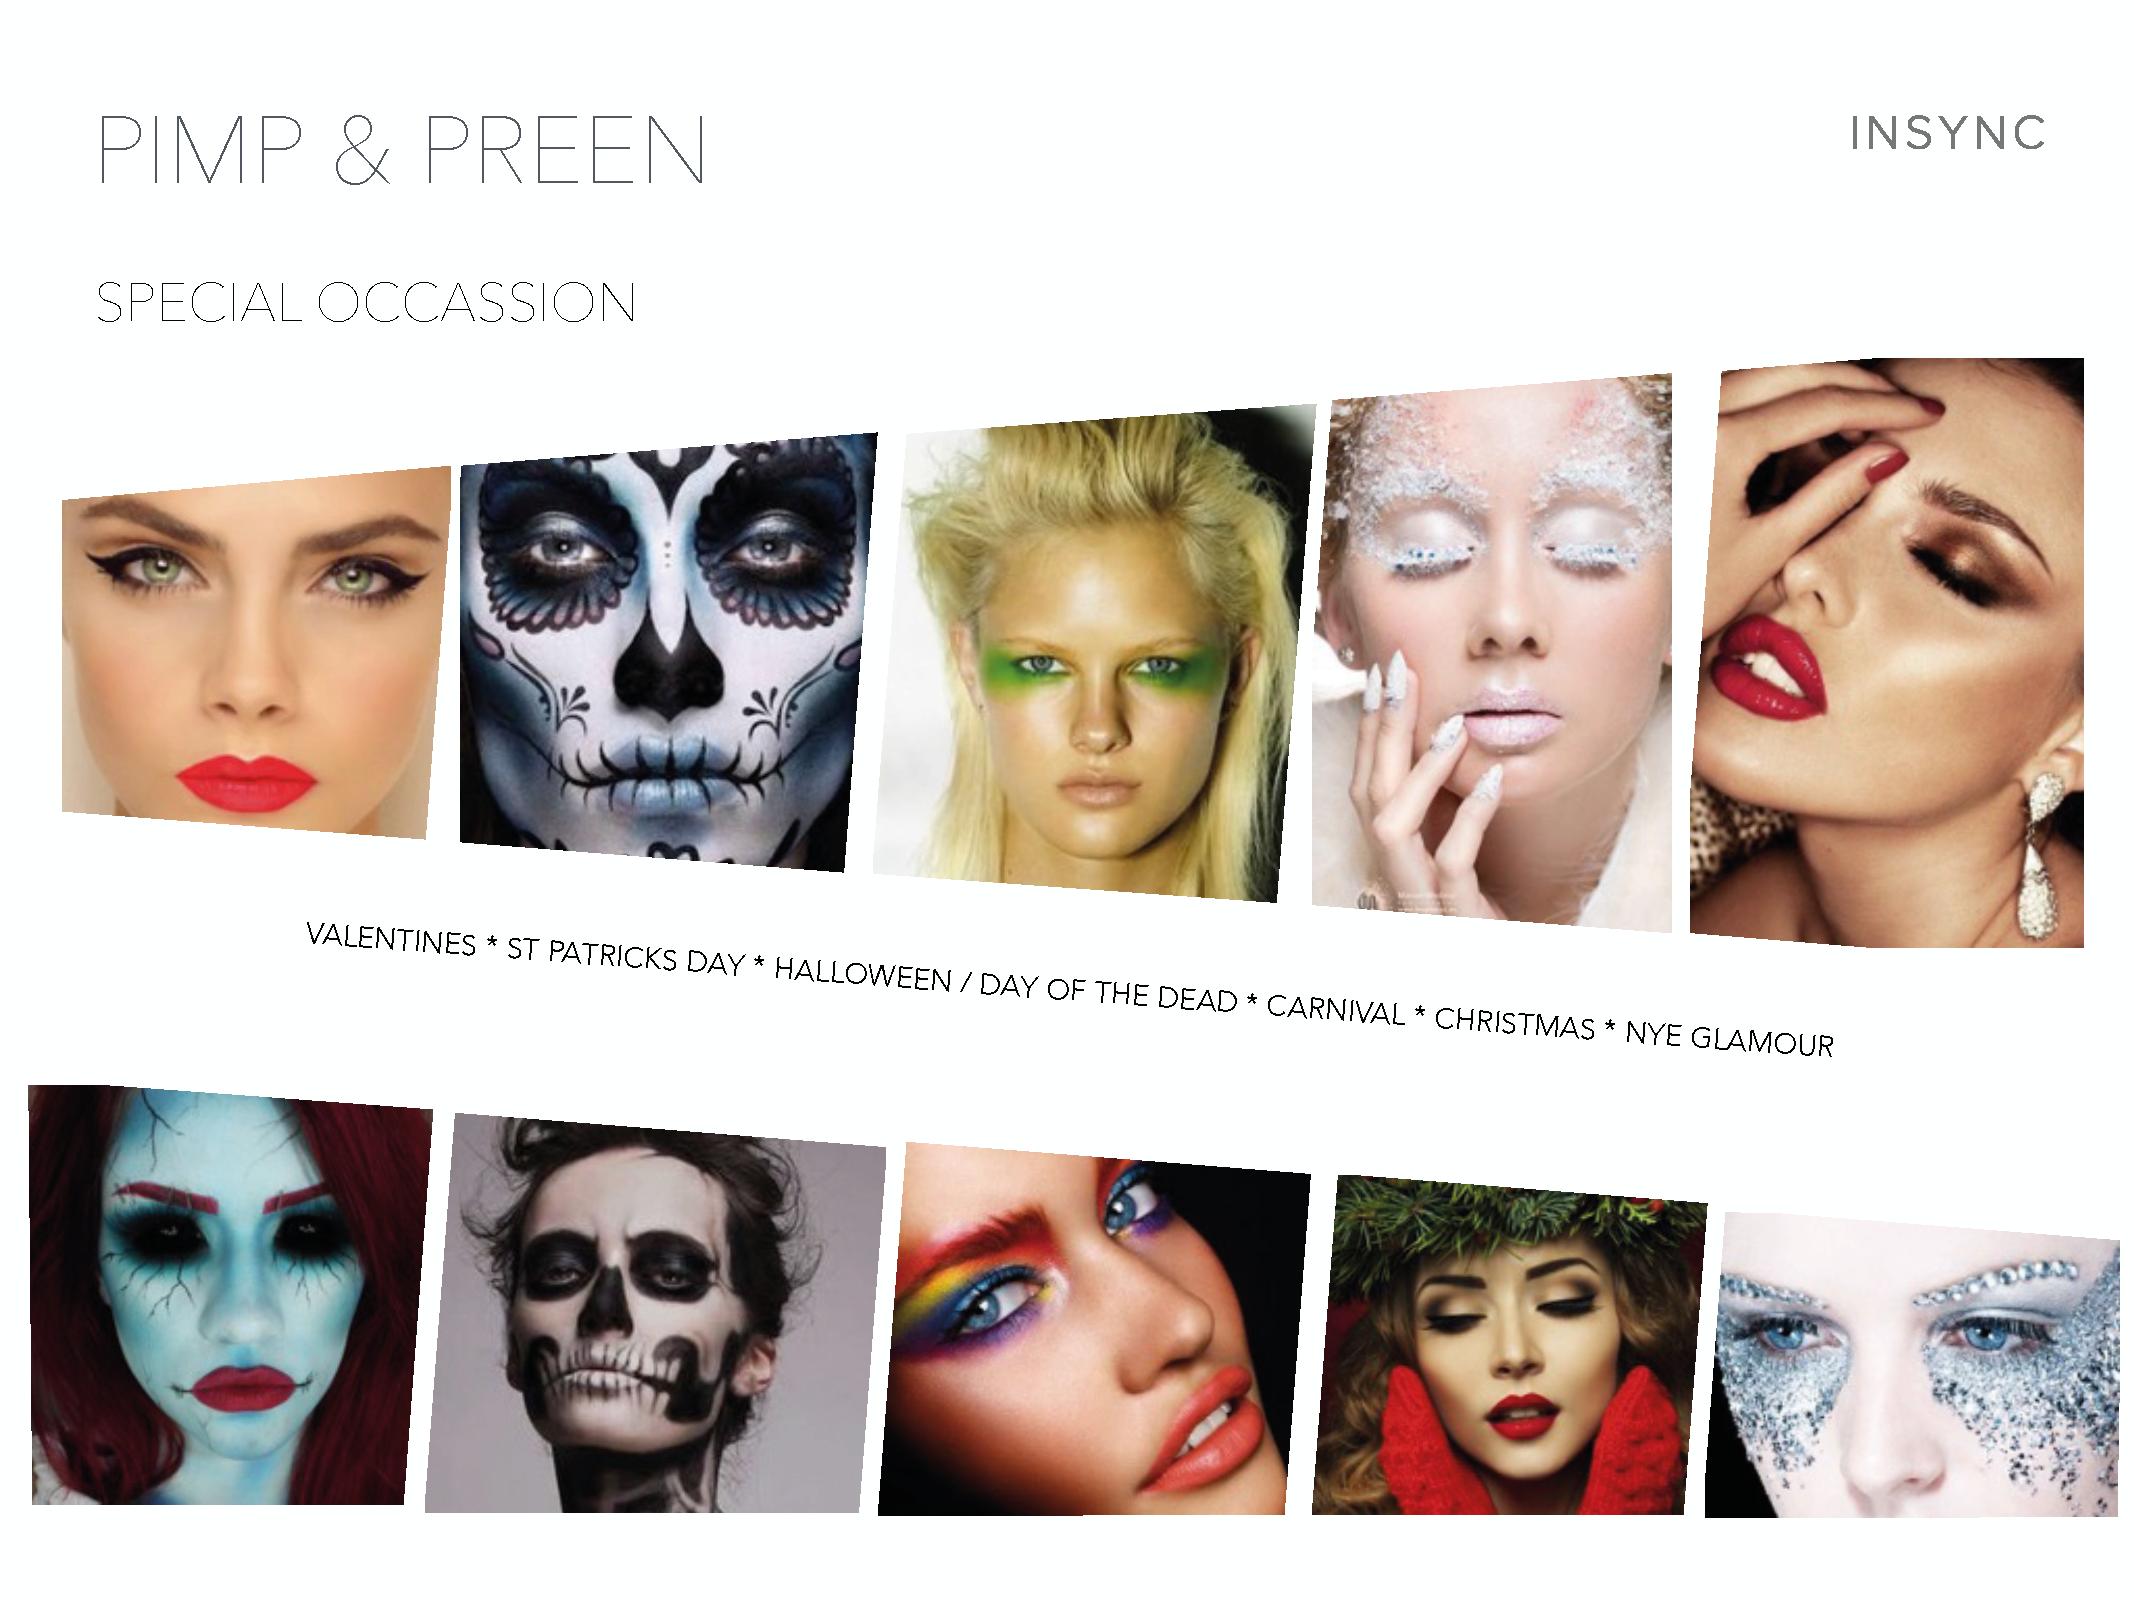 Pimp & Preen_Page_12.png